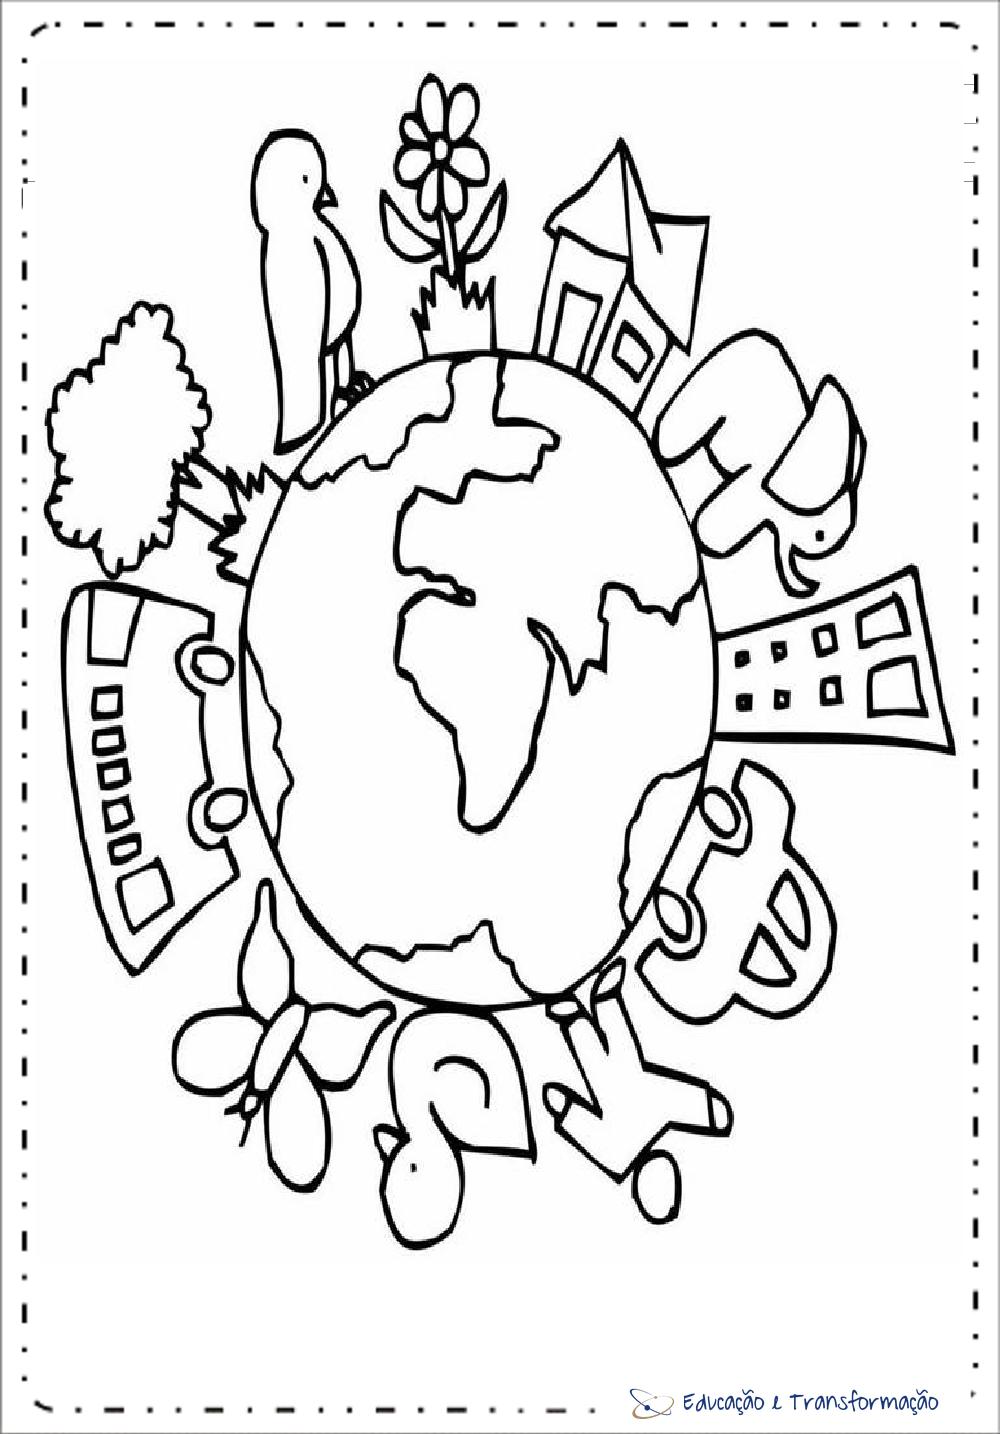 Desenhos Para Colorir Meio Ambiente Para Imprimir Educacao E